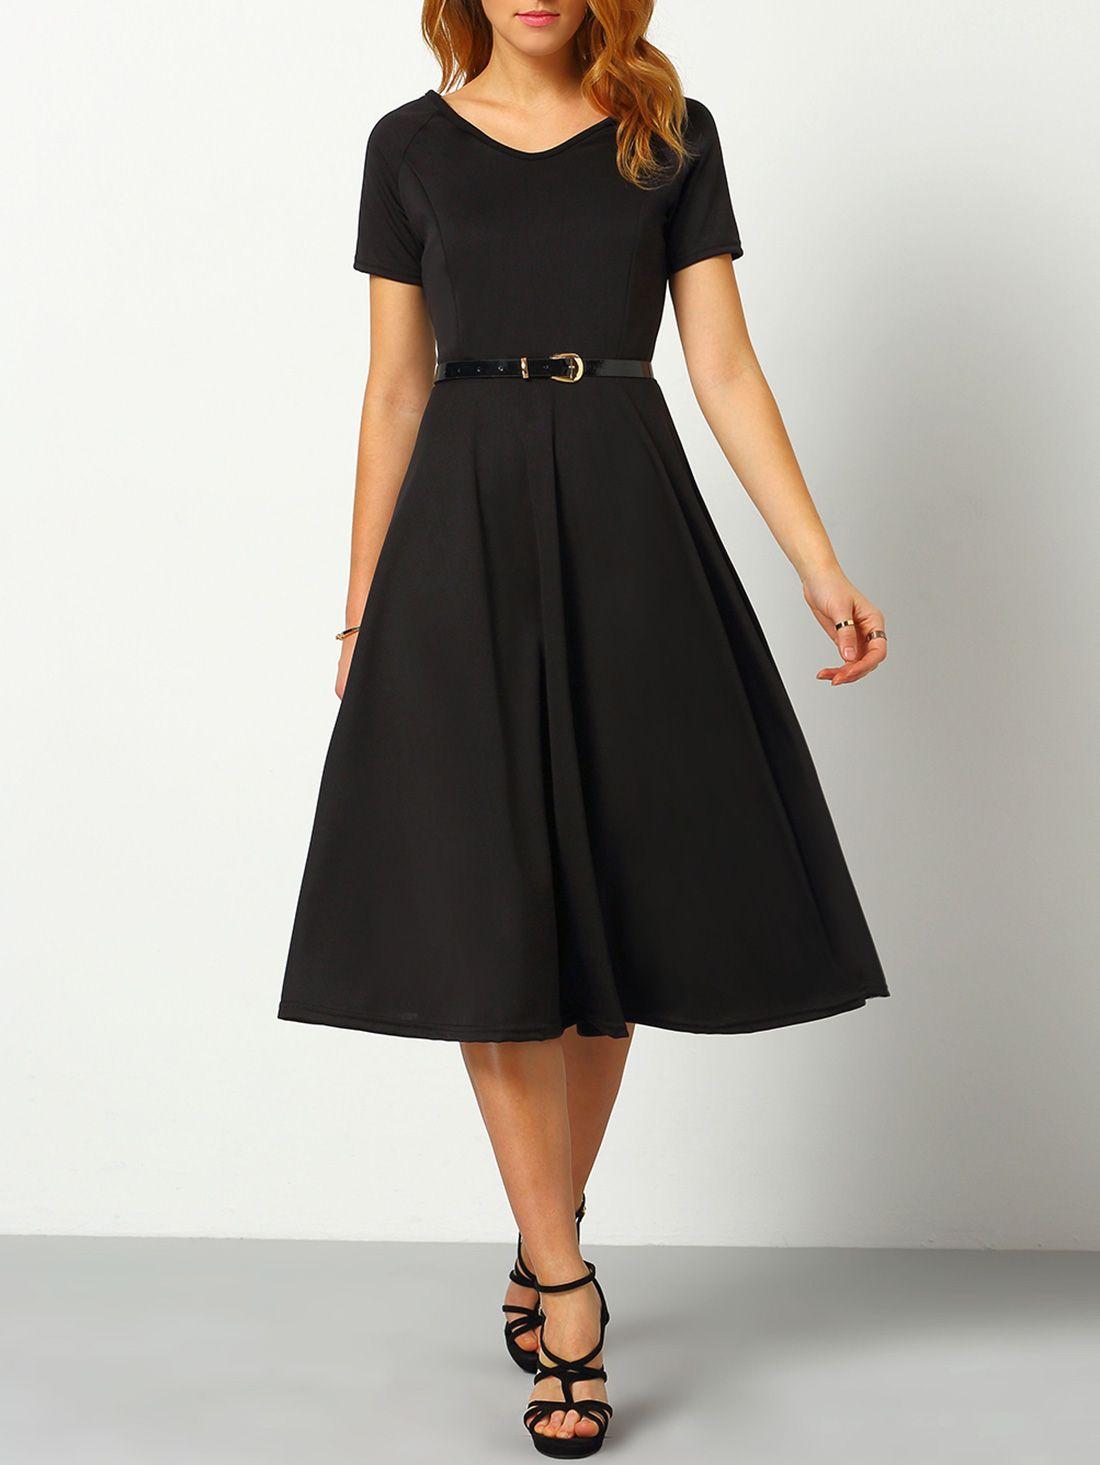 V Neck A Line Dress With Belt Dresses A Line Dress Long Black Dress [ 1465 x 1100 Pixel ]